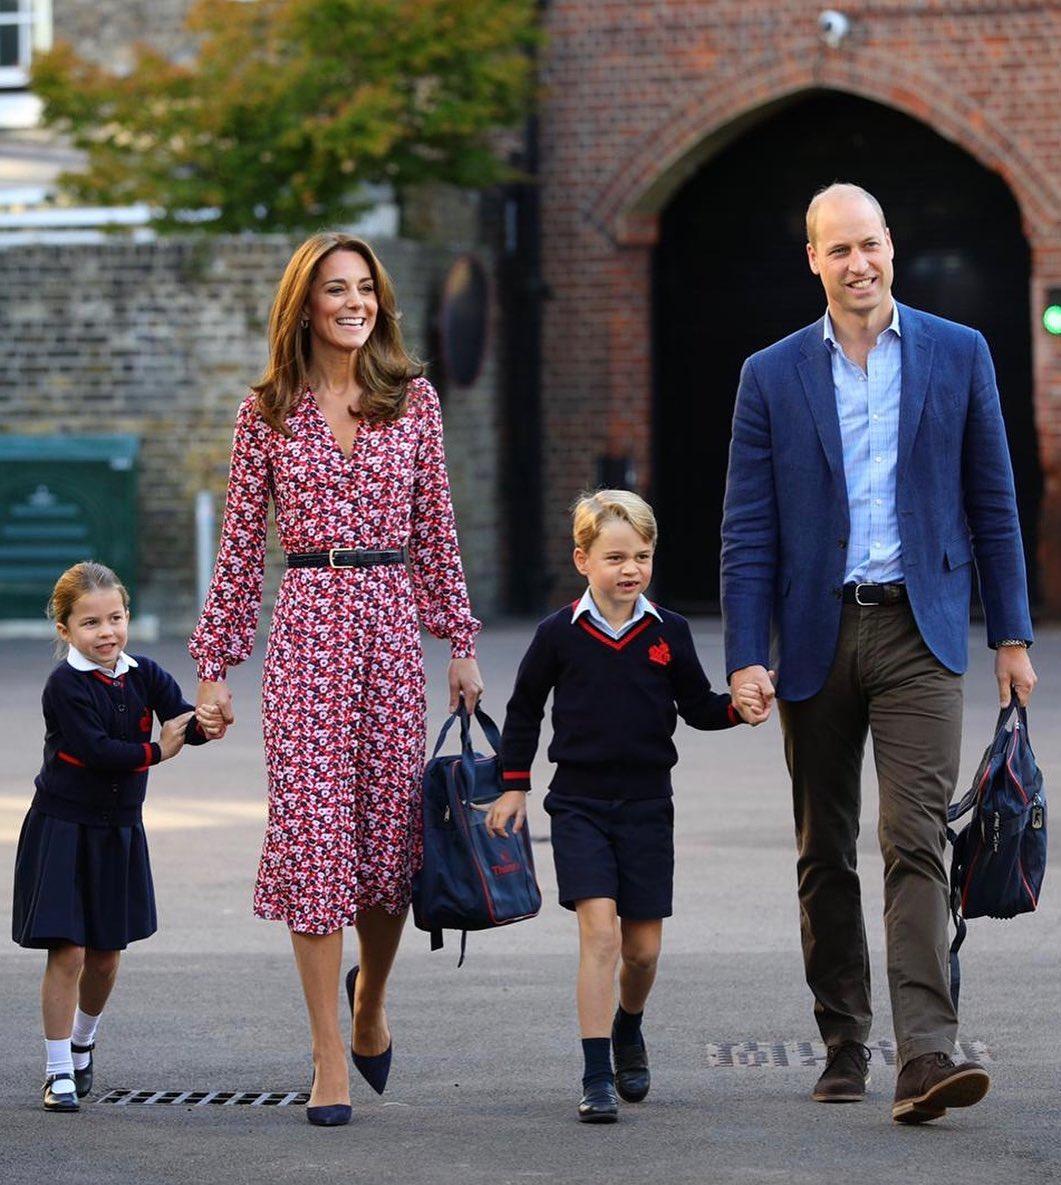 Kate Midletton: Τι φόρεσε για να συνοδεύσει τα παιδιά της στο σχολείο;